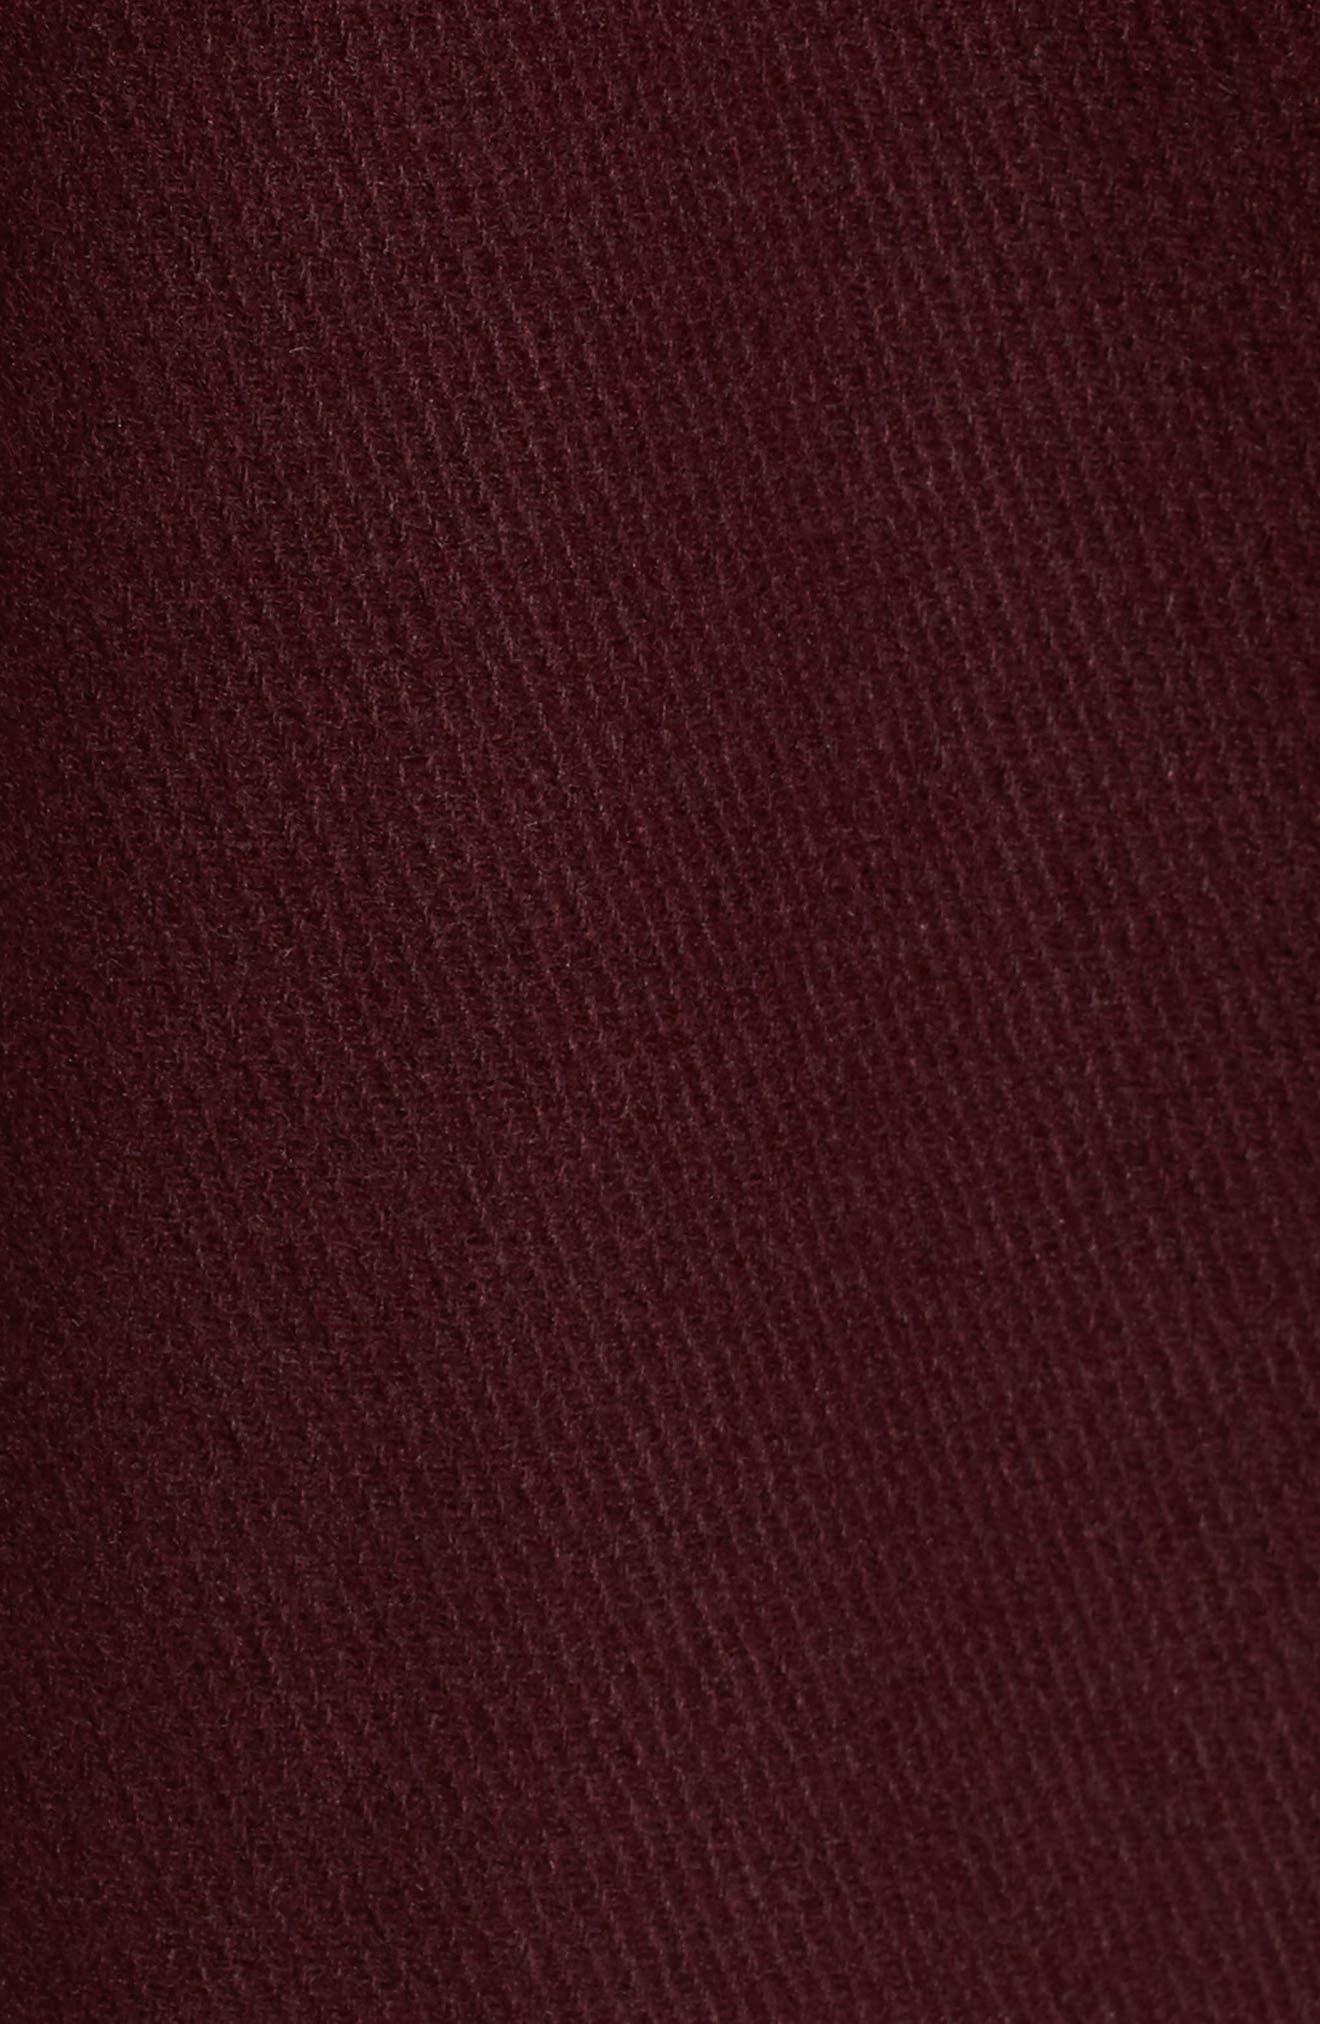 Wool Blend Military Coat,                             Alternate thumbnail 10, color,